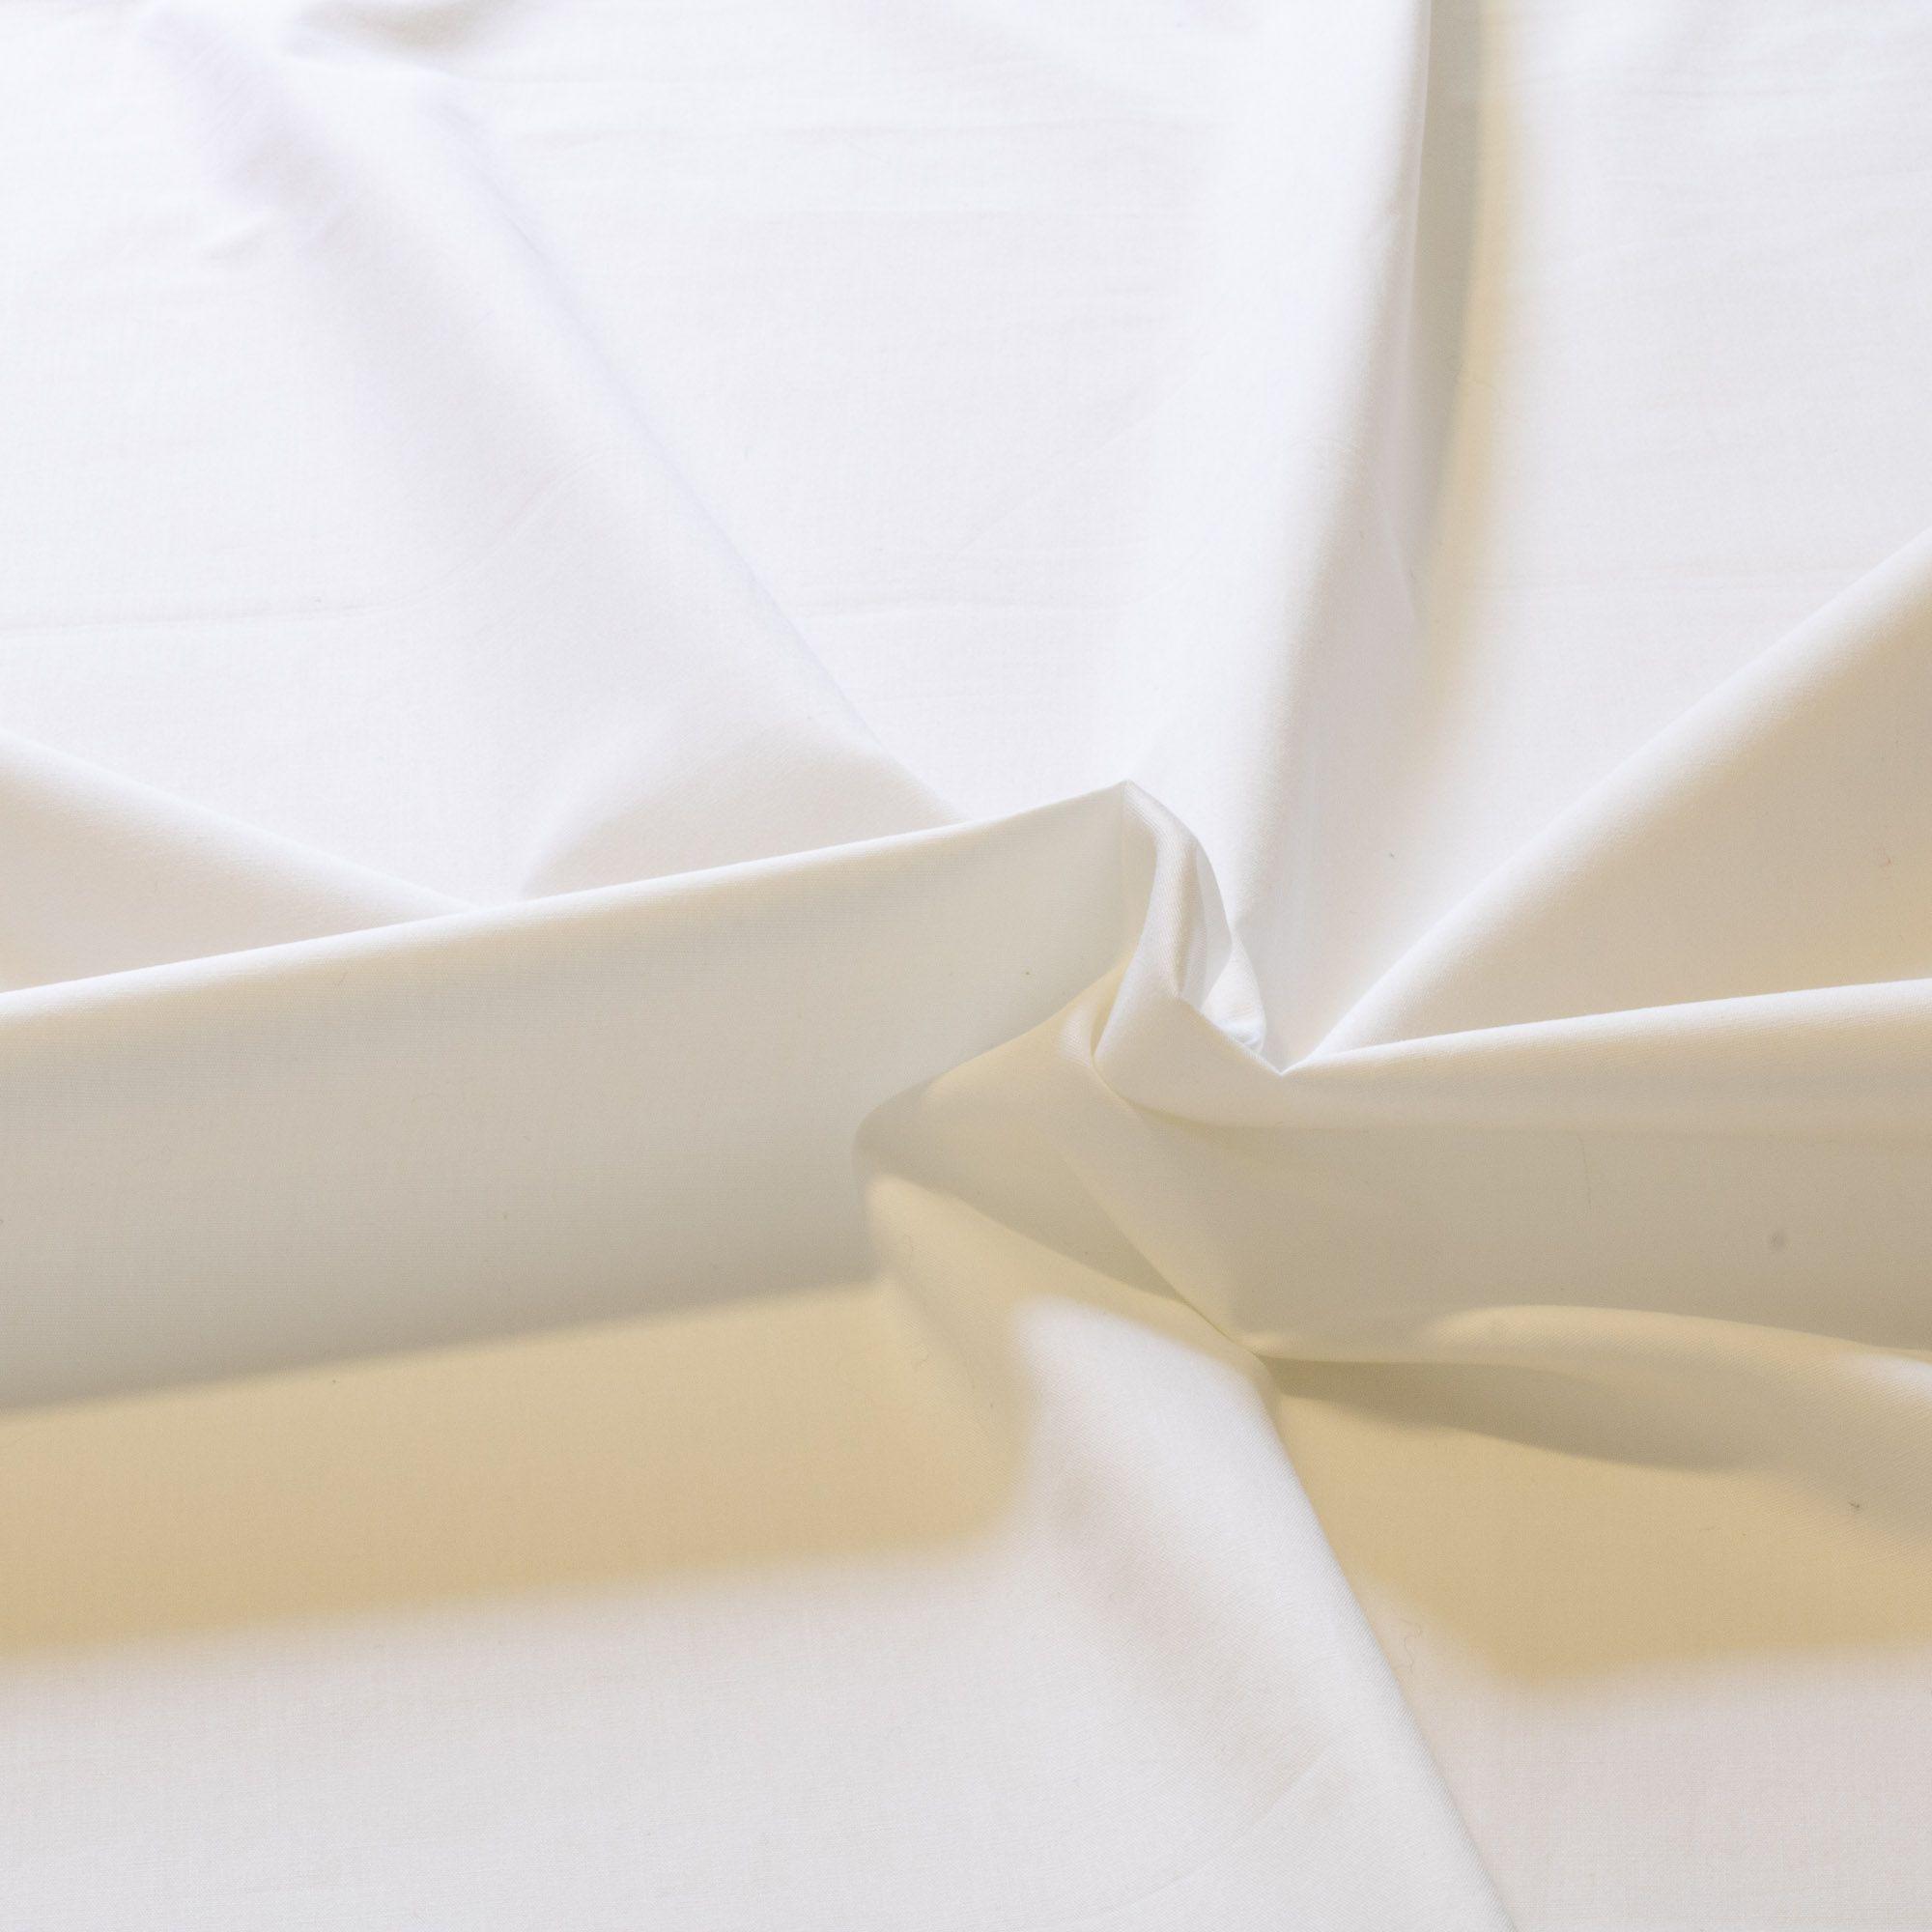 Tecido Tricoline 100% Algodao 1,50 Mt Largura Branco